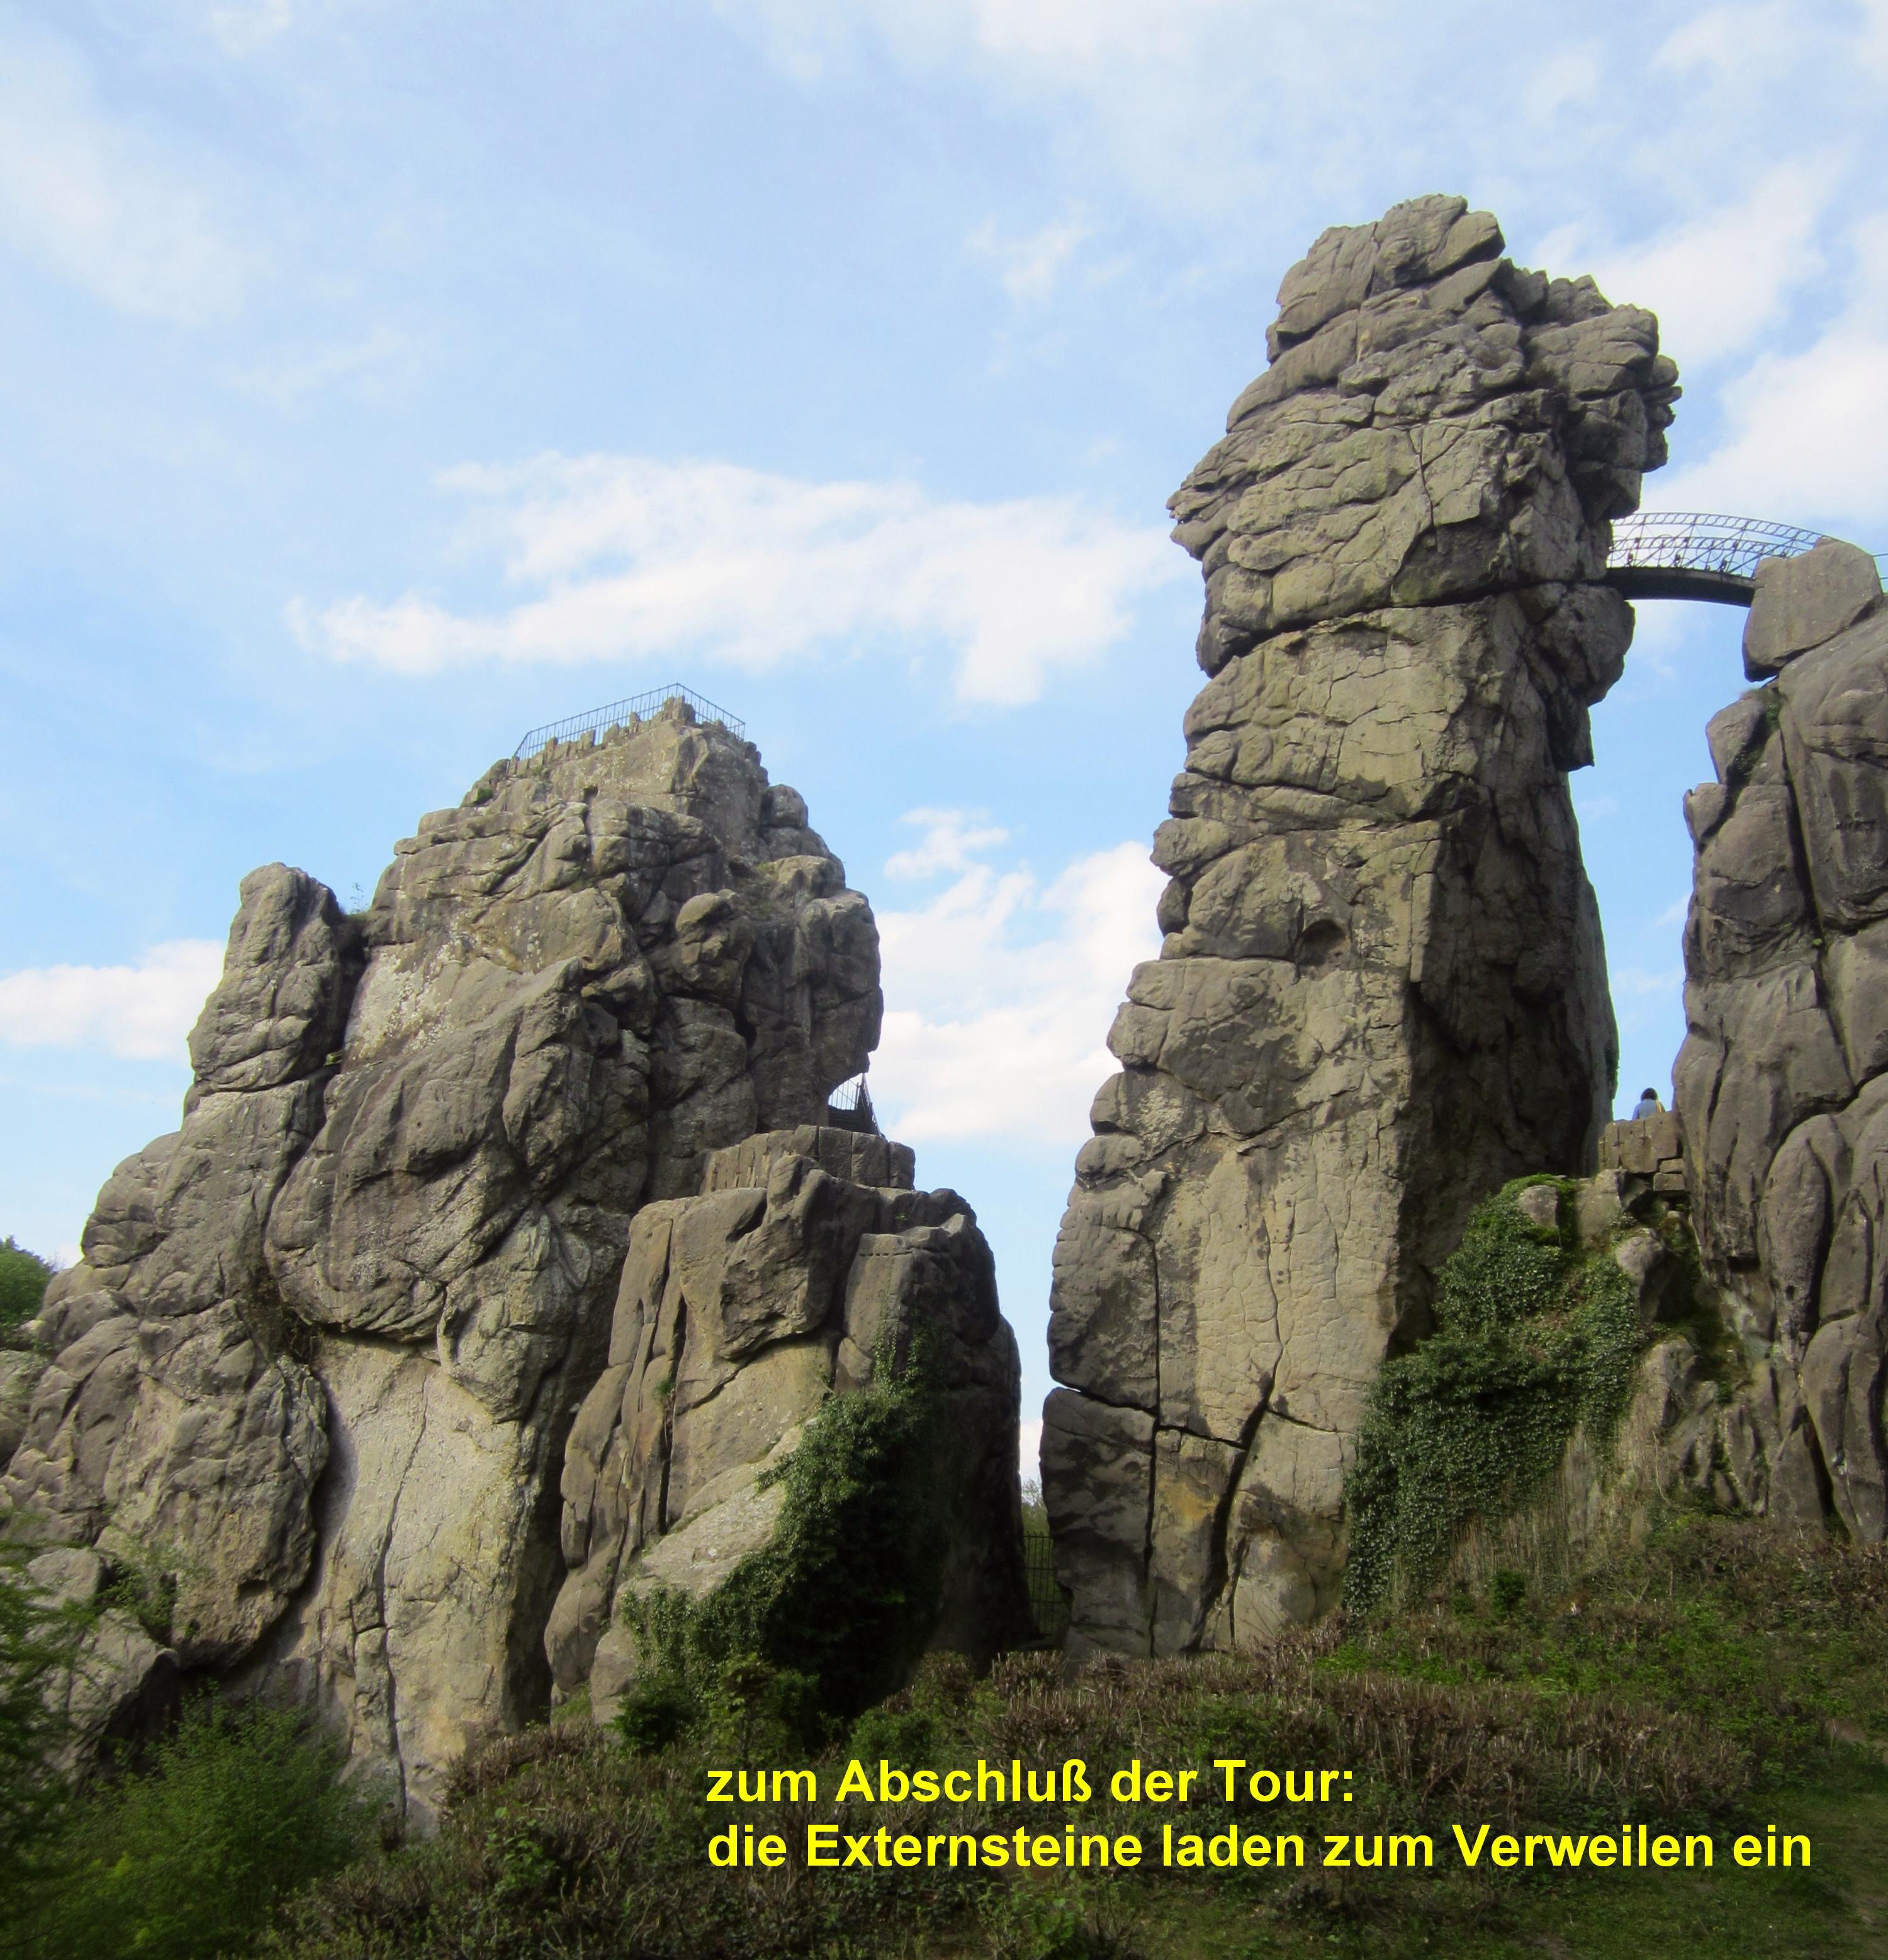 Externsteine, Natur- u. Kulturdenkmal im Naturpark Teutoburger Wald